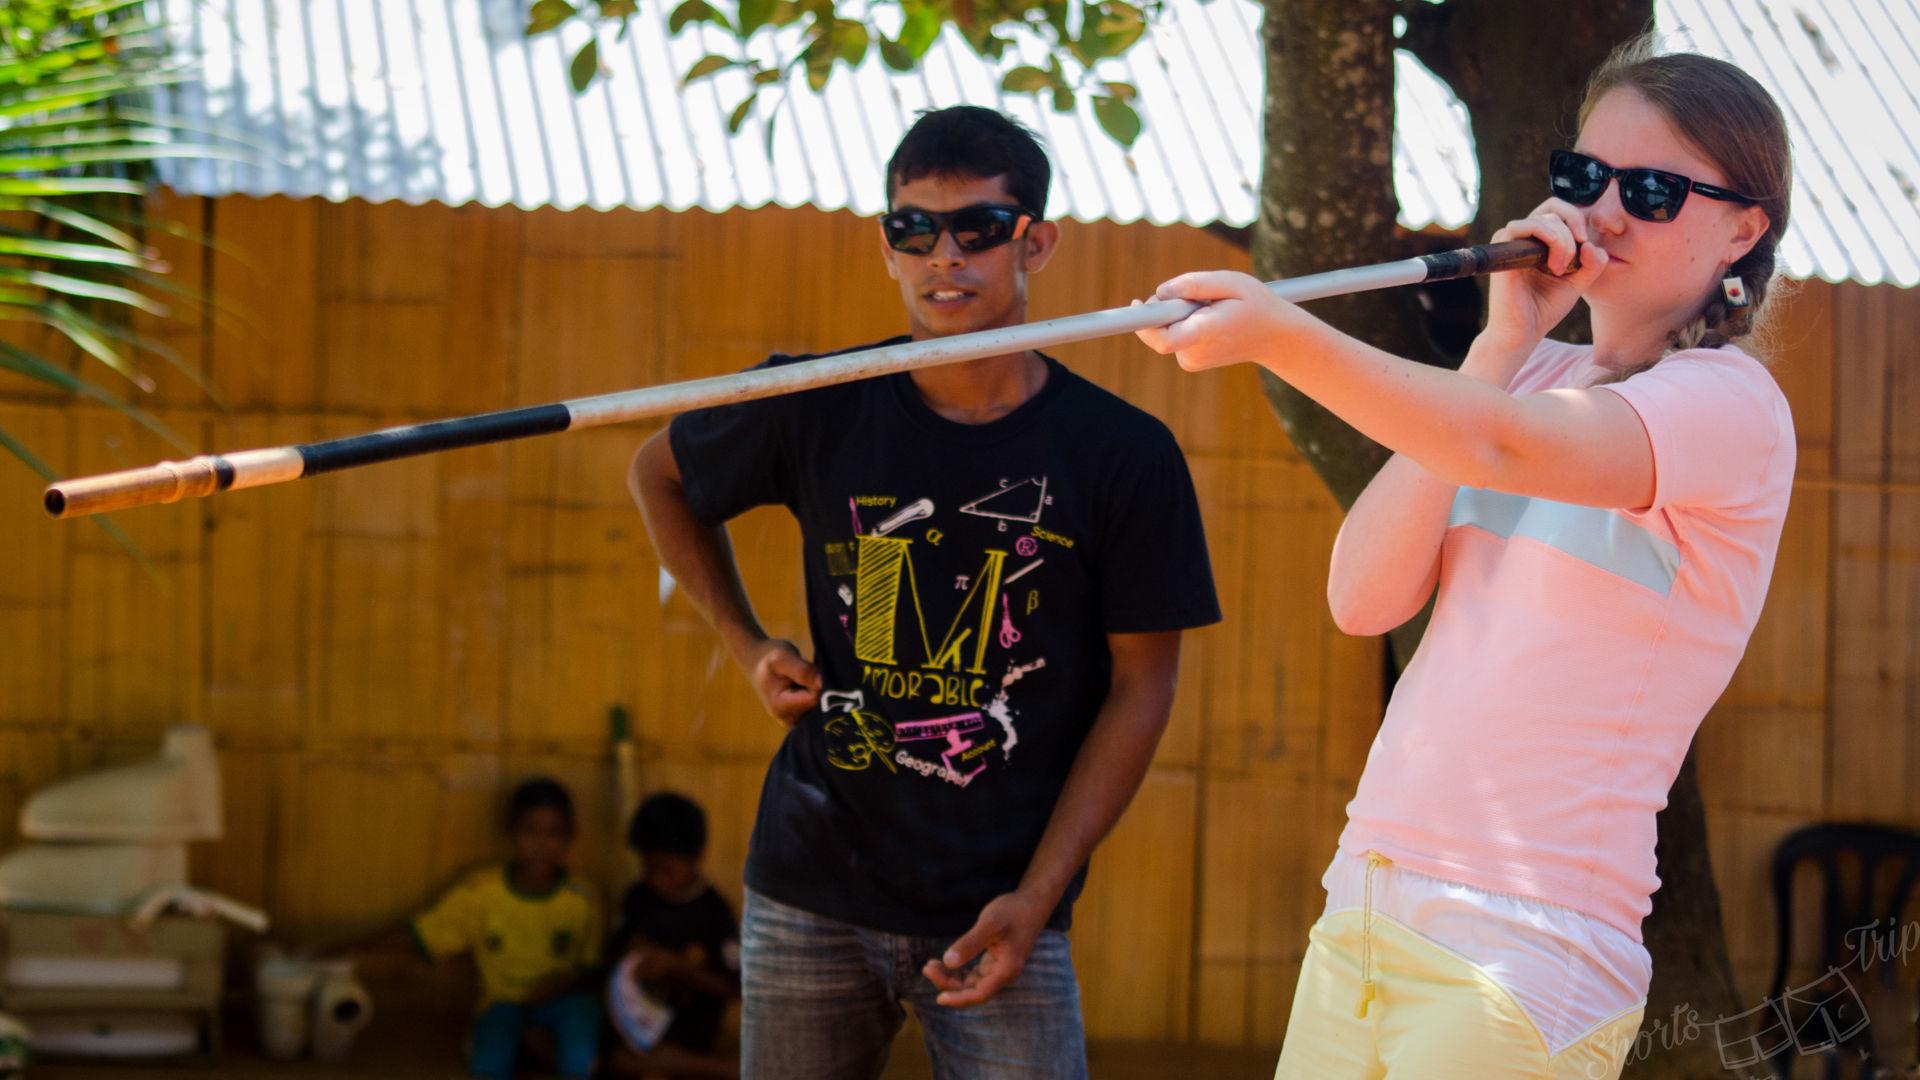 blowpipe, girl blowing blowpipe, aborigine weapon, asli weapon